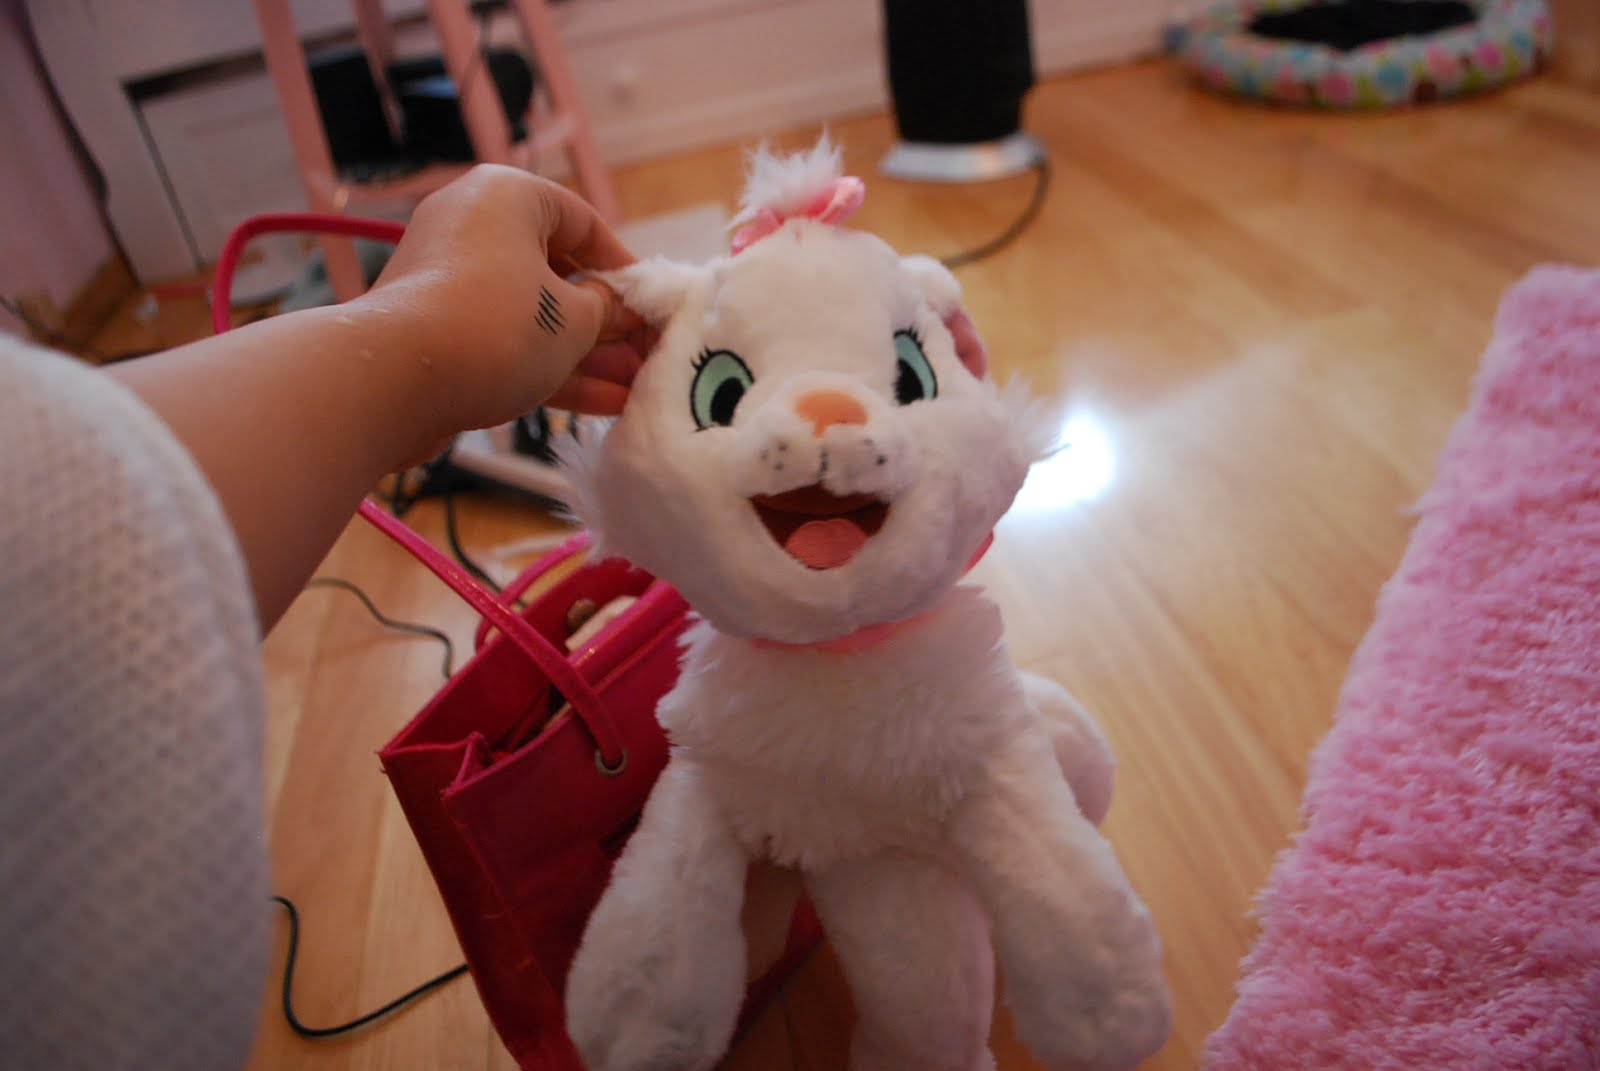 How to Make a Stuffed Animal How to Make a Stuffed Animal new foto